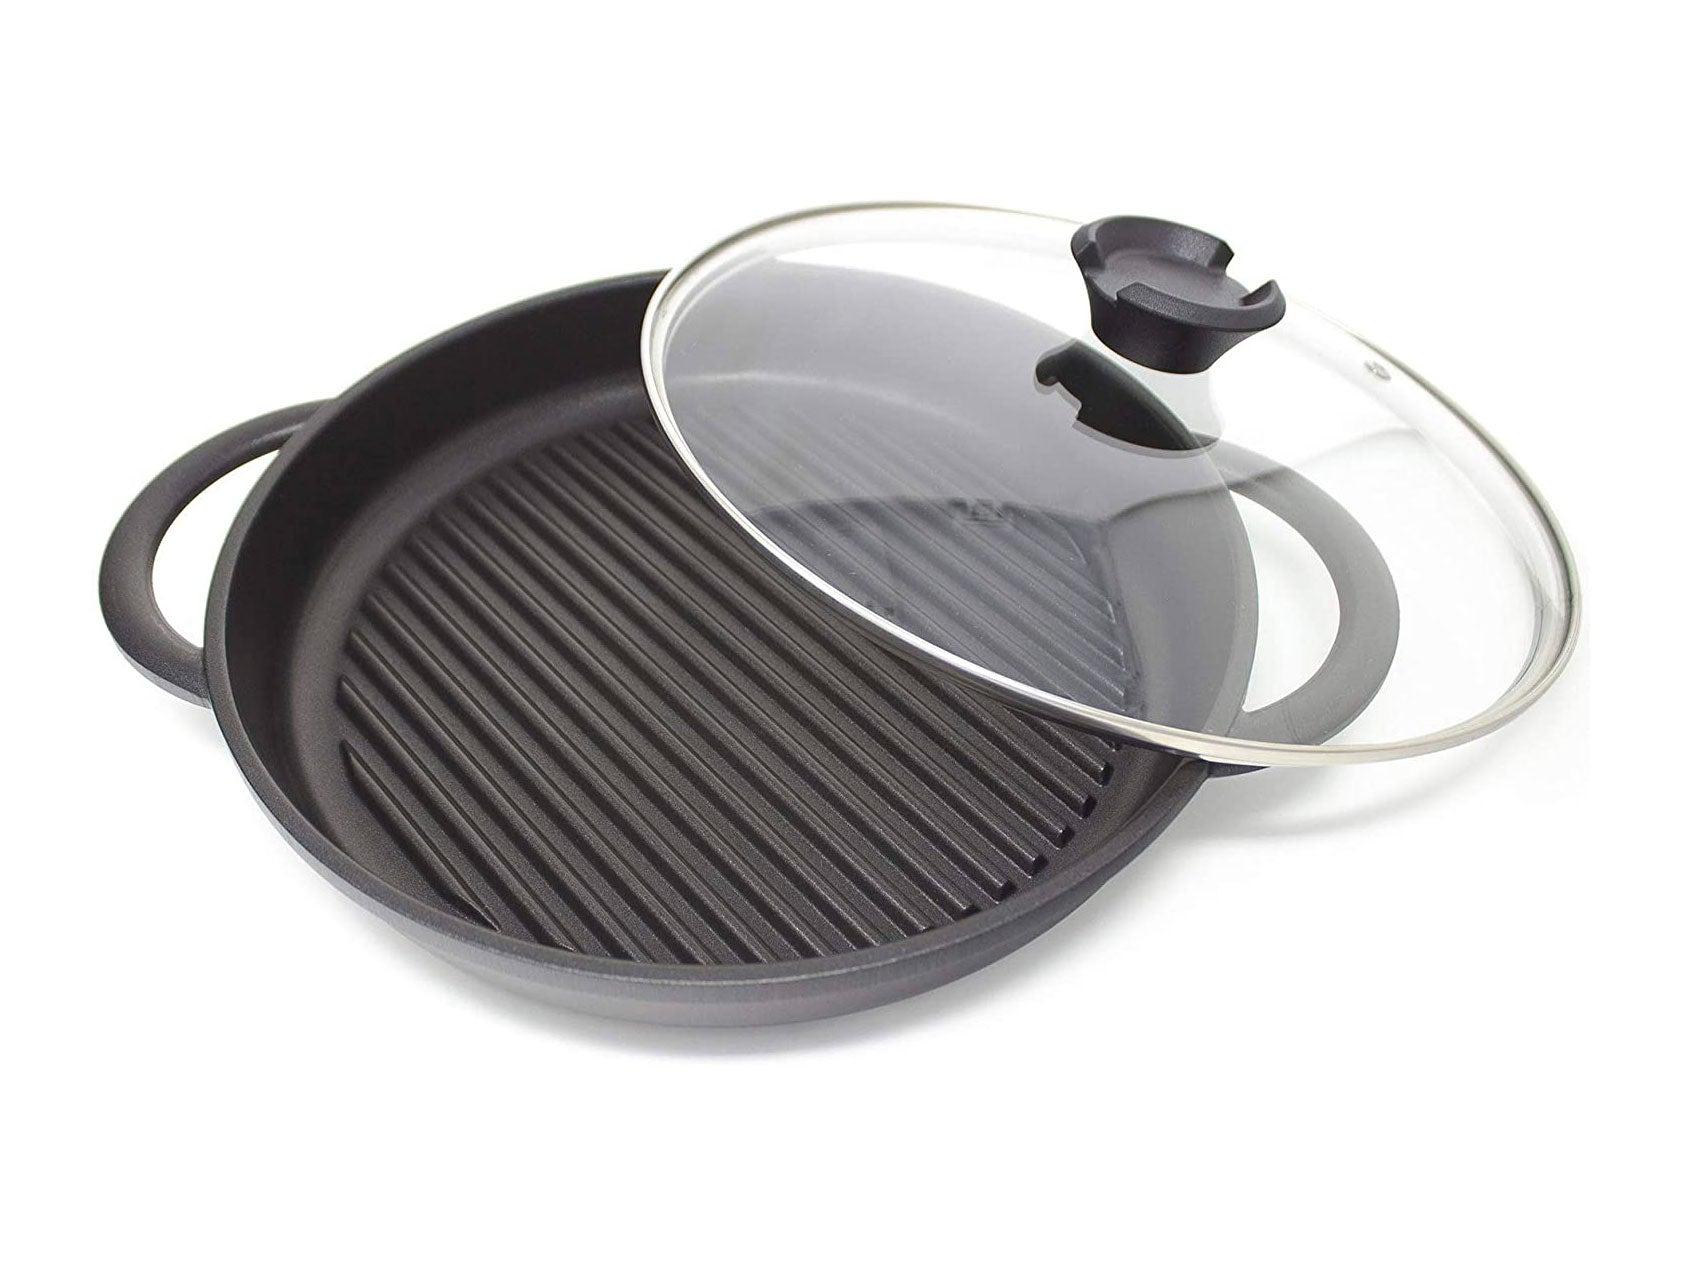 Jean-Patrique The Whatever Pan - Cast Aluminium Griddle Pan with Glass Lid | 10.6